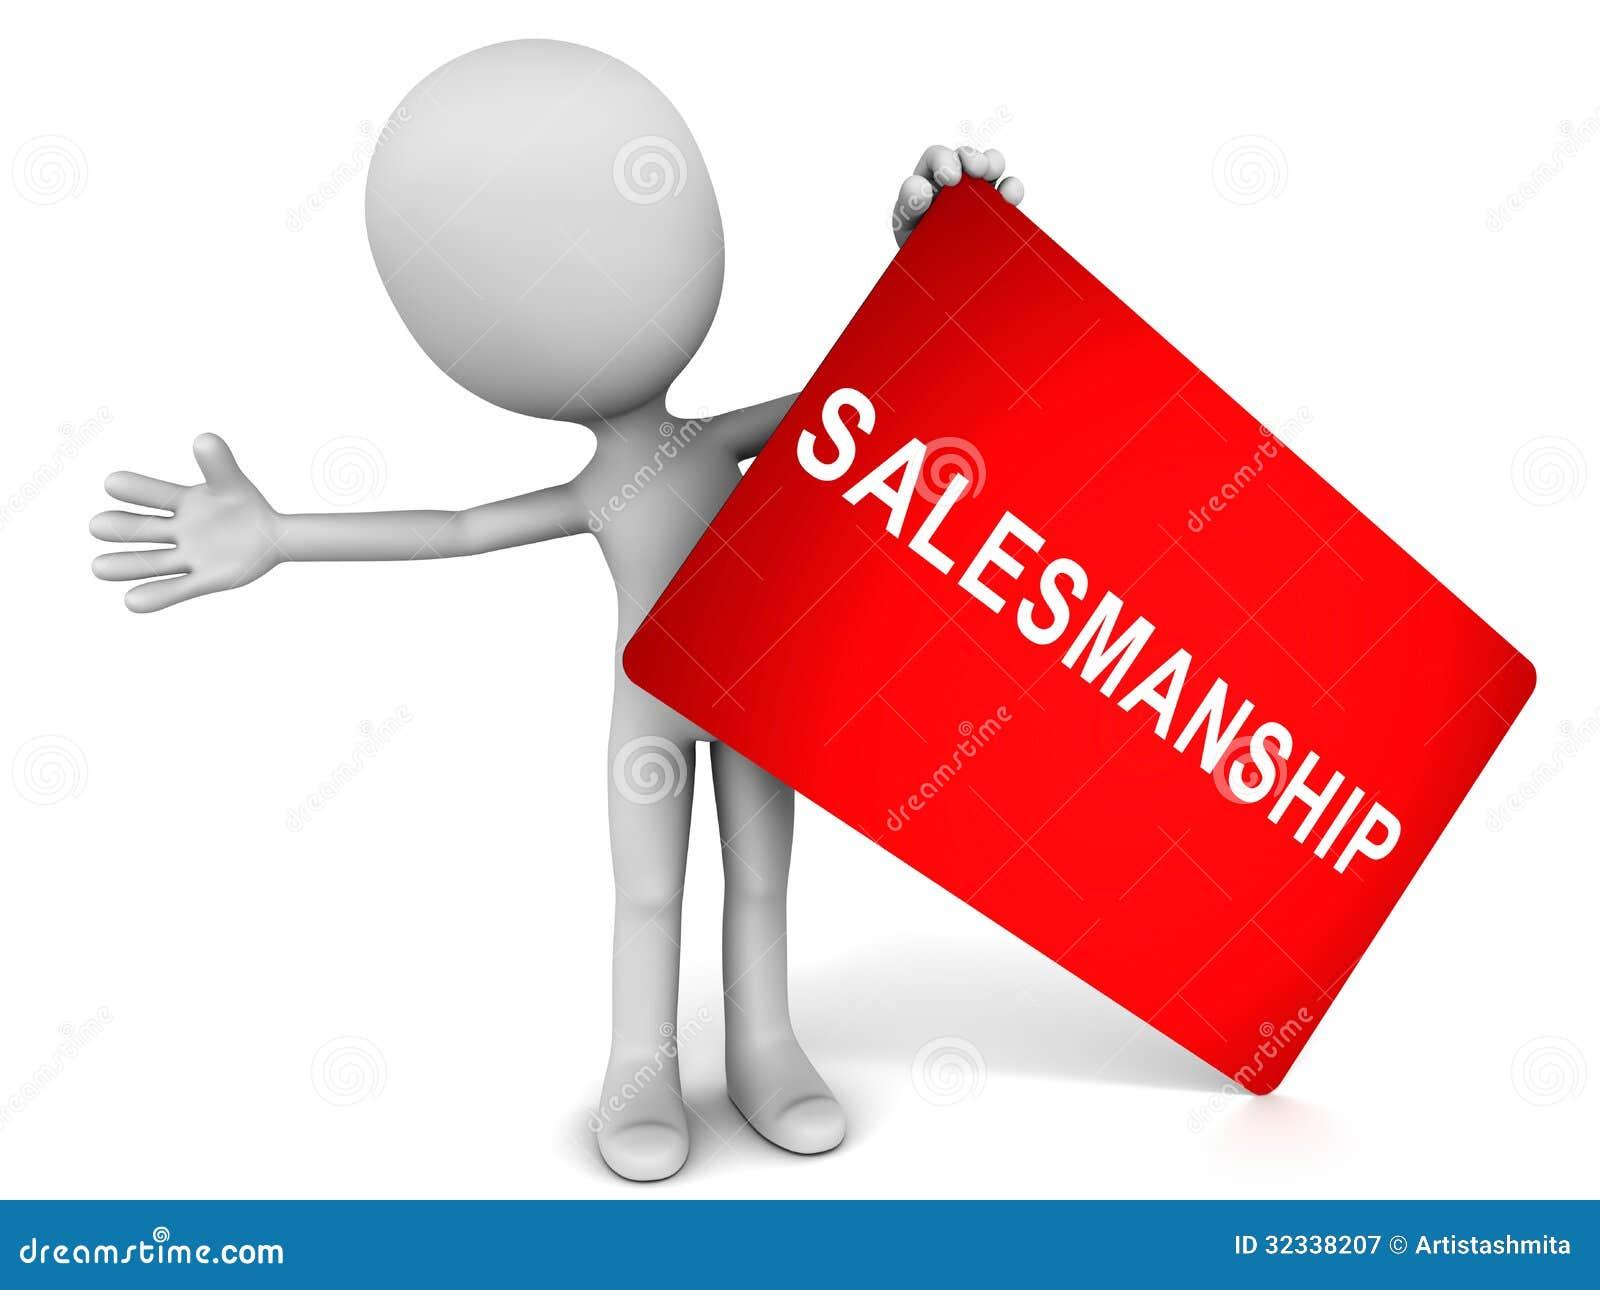 Salesmanship Royalty Free Stock Photography - Image: 32338207